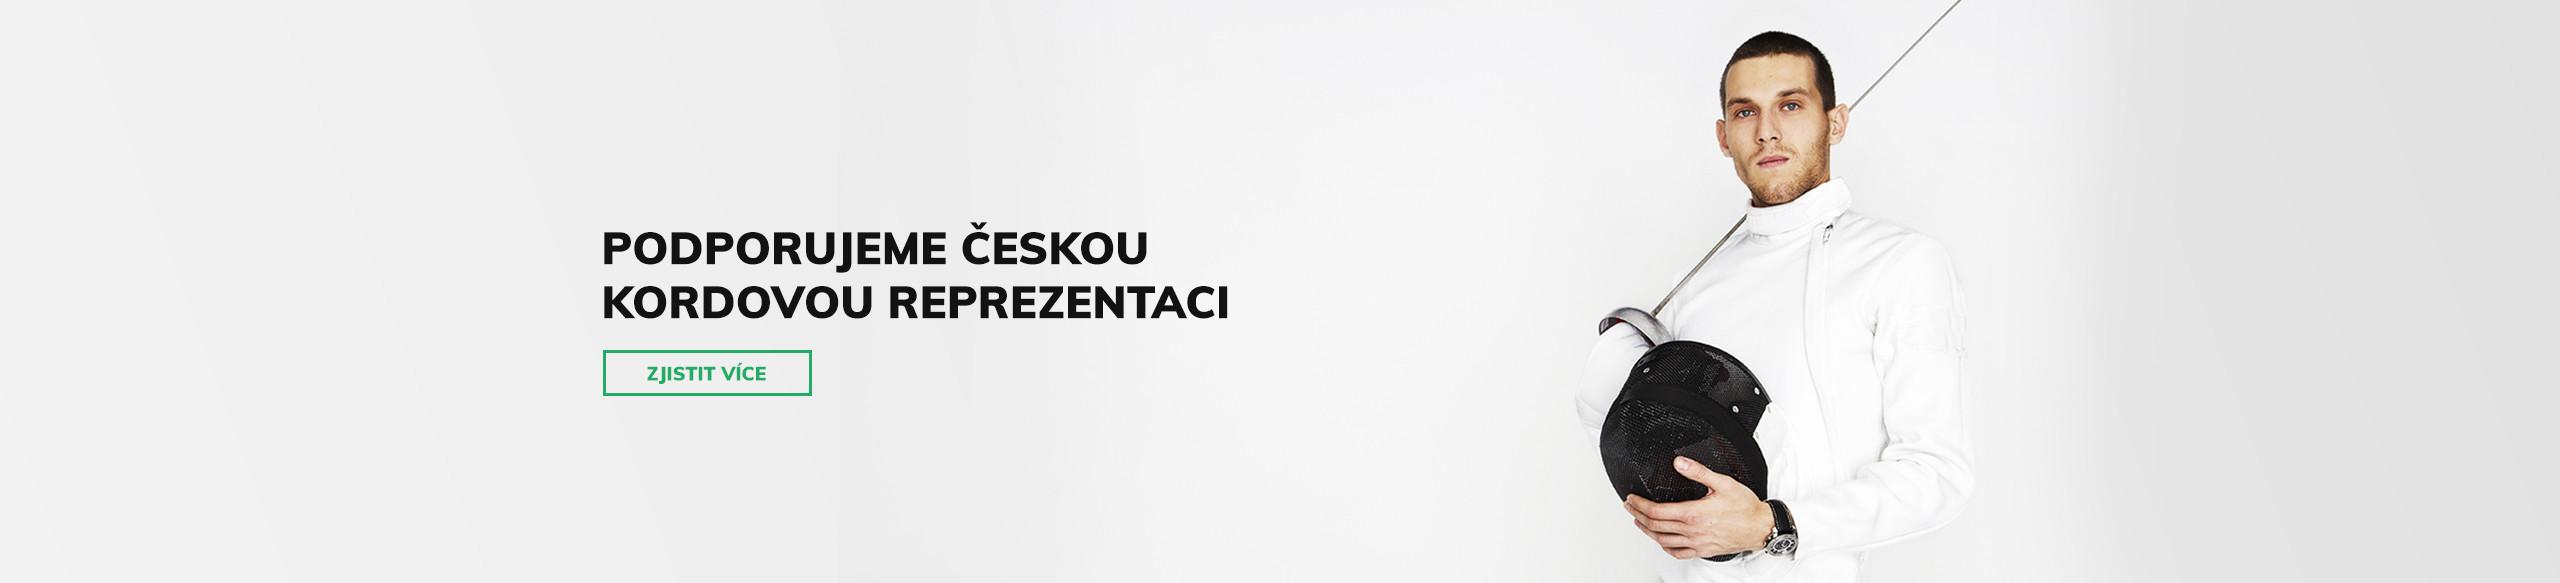 Podporujeme českou kordovou reprezentaci